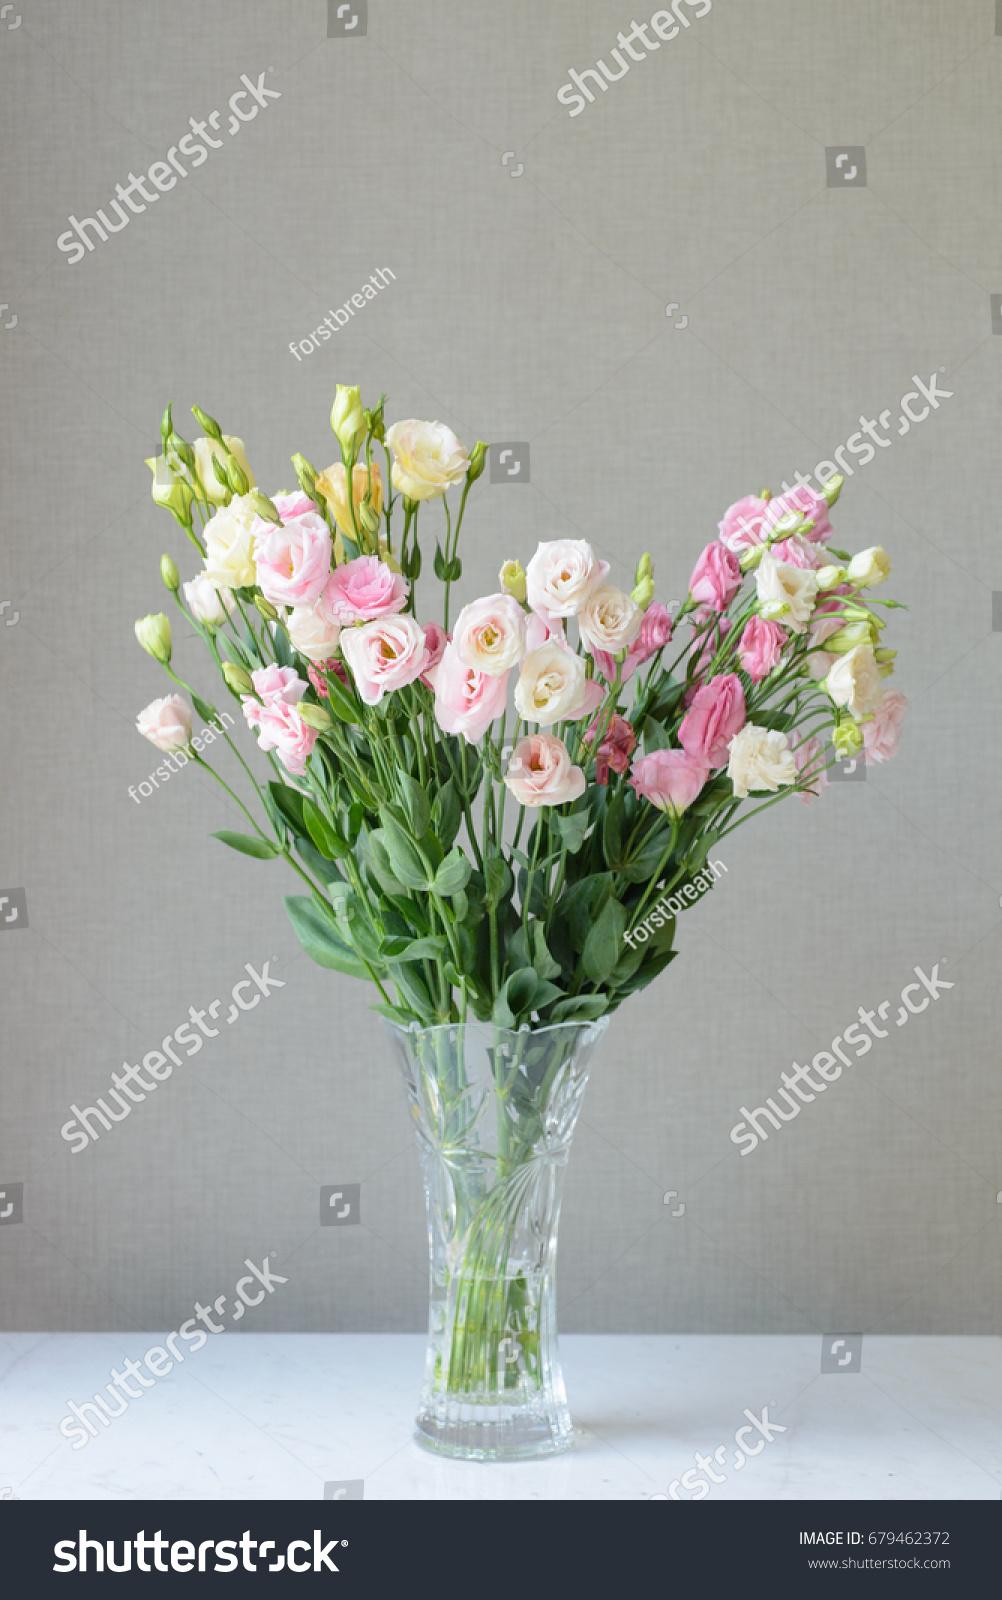 Beautiful flower vase simple background stock photo edit now a beautiful flower vase with a simple background izmirmasajfo